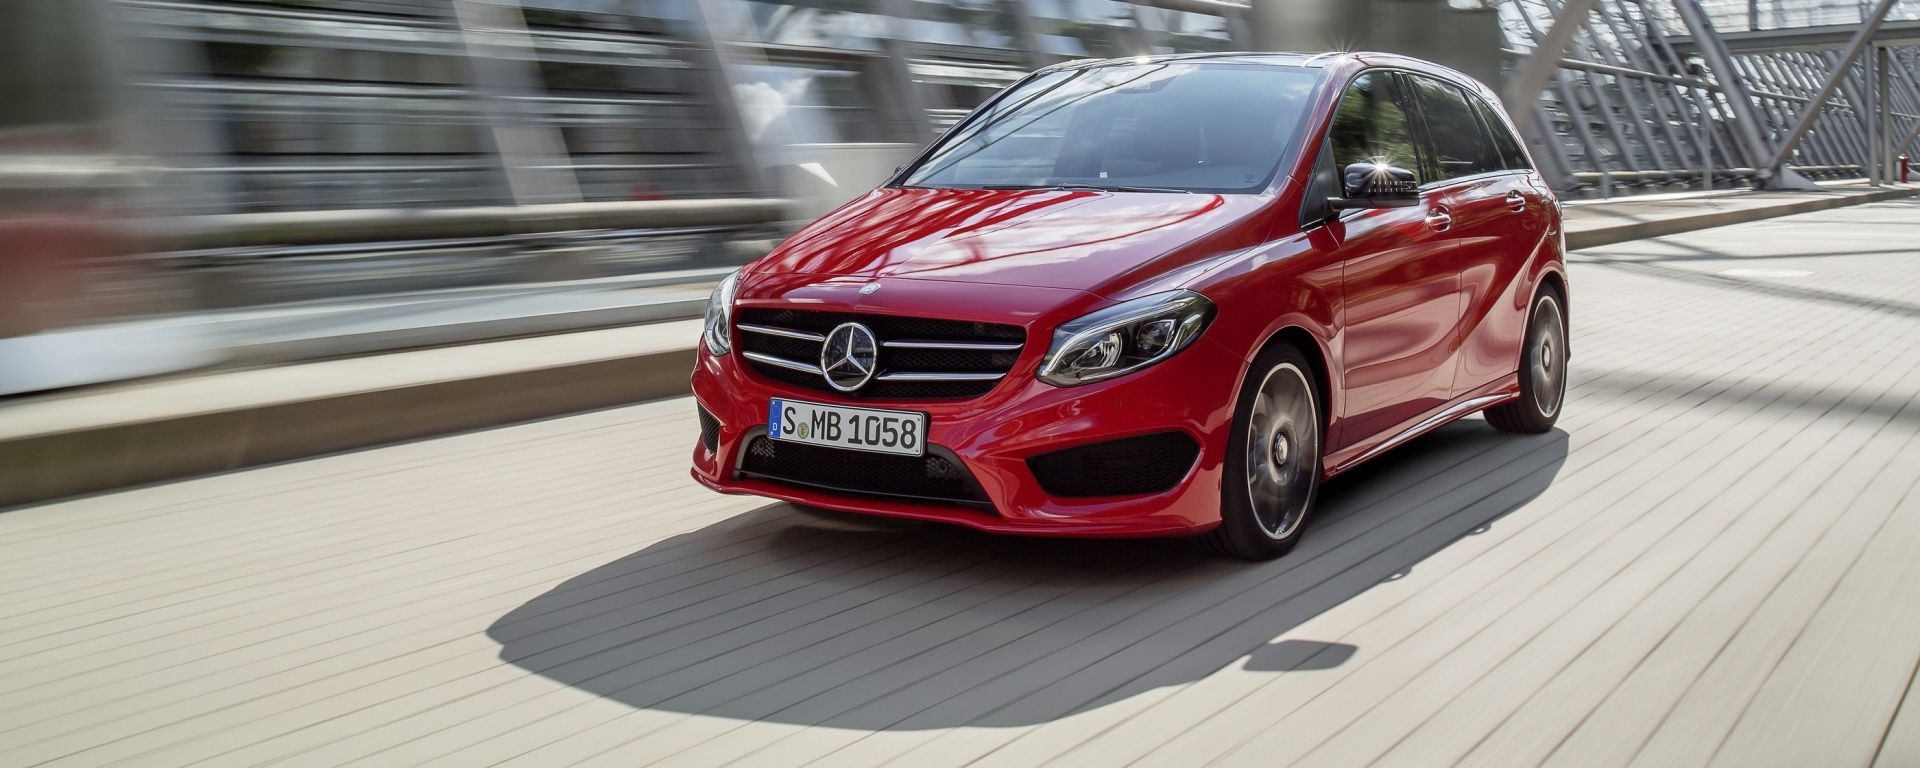 Nuova Mercedes Classe B Tech